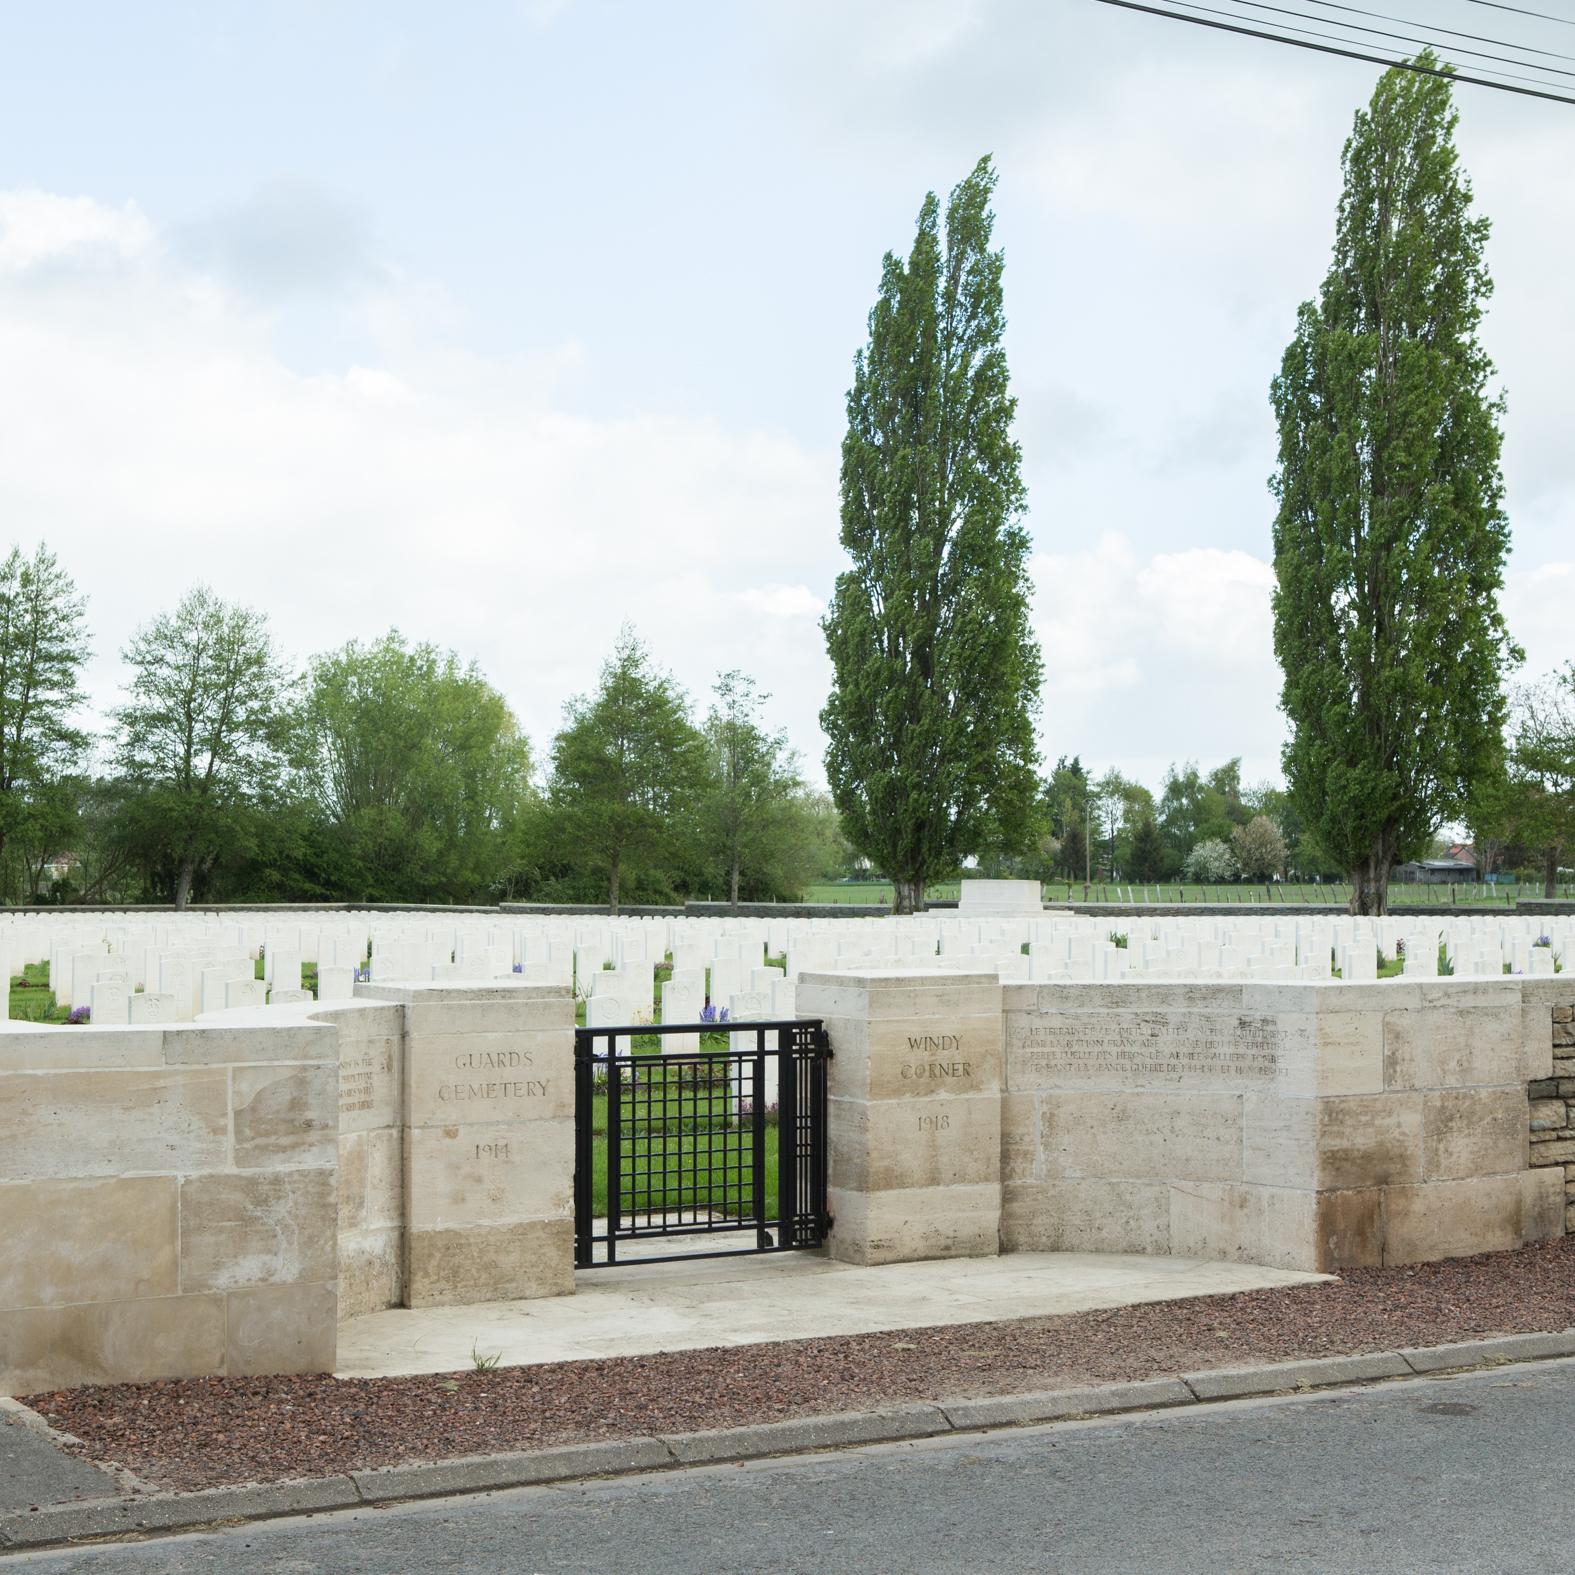 Guards Cemetery, Windy Corner